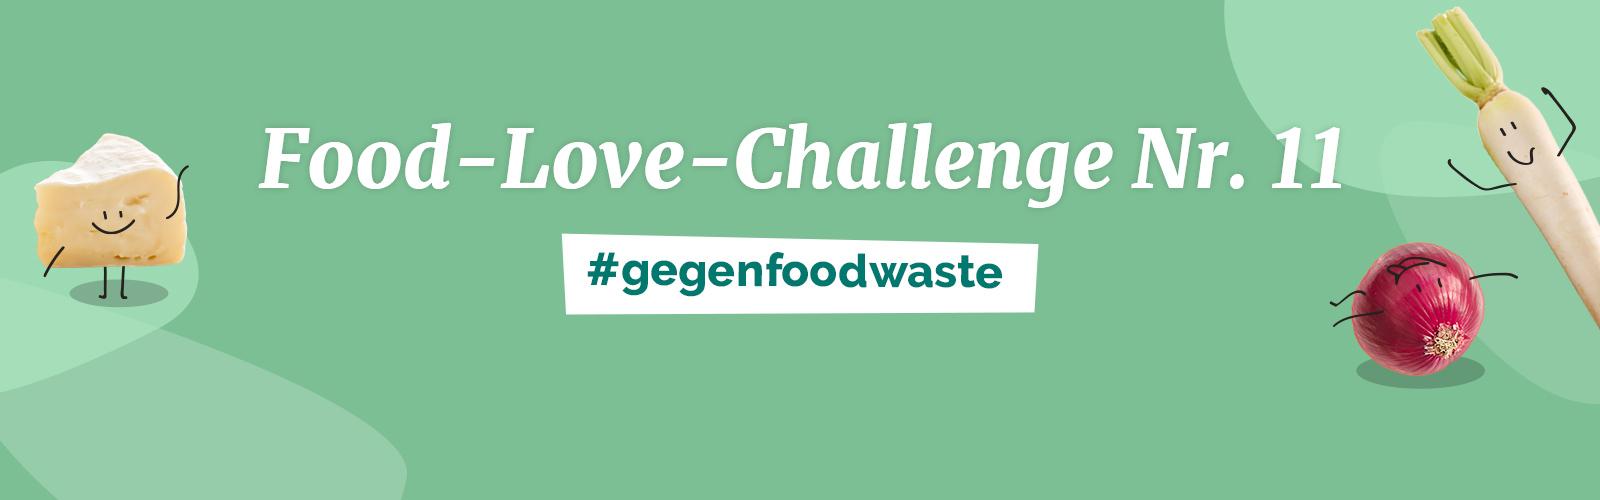 Food Love Challenge Nr. 11